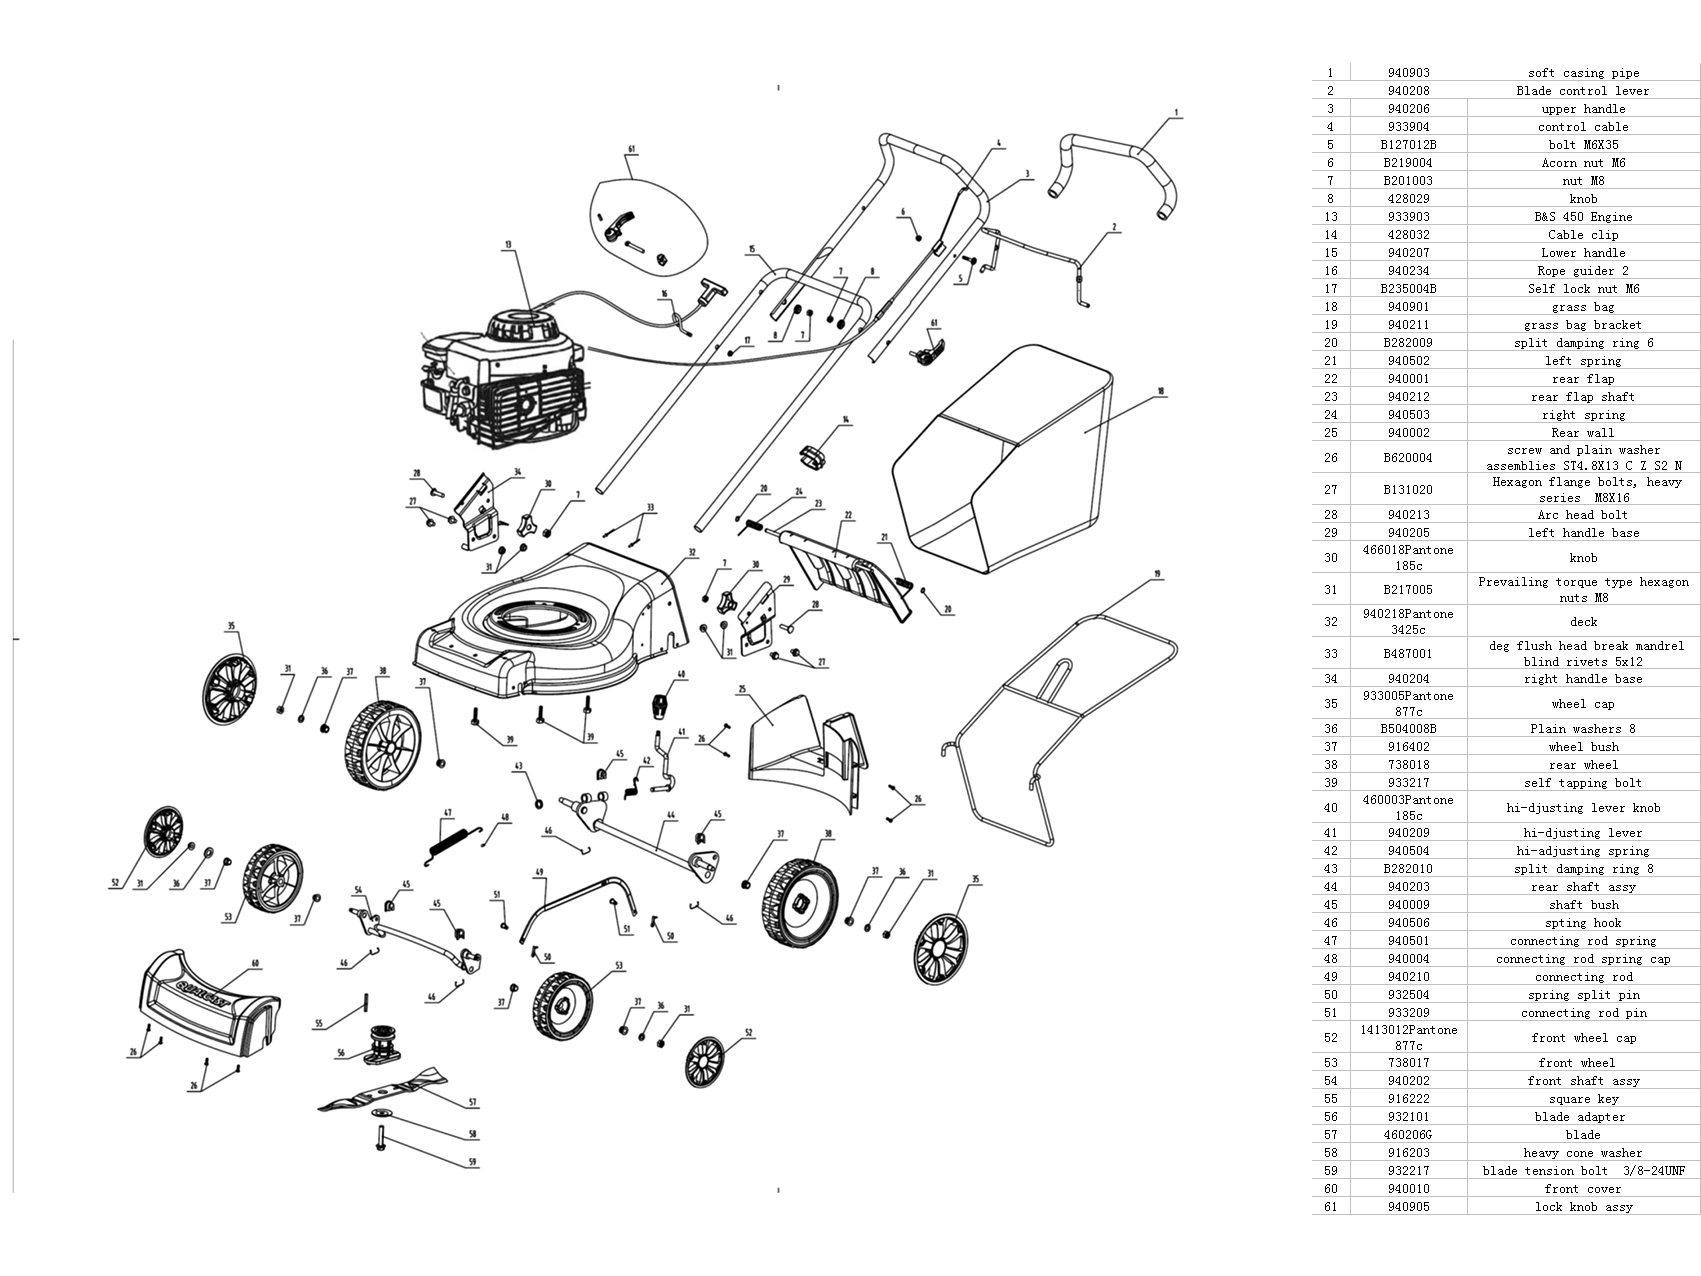 Qualcast 46cm Push Petrol Lawnmower